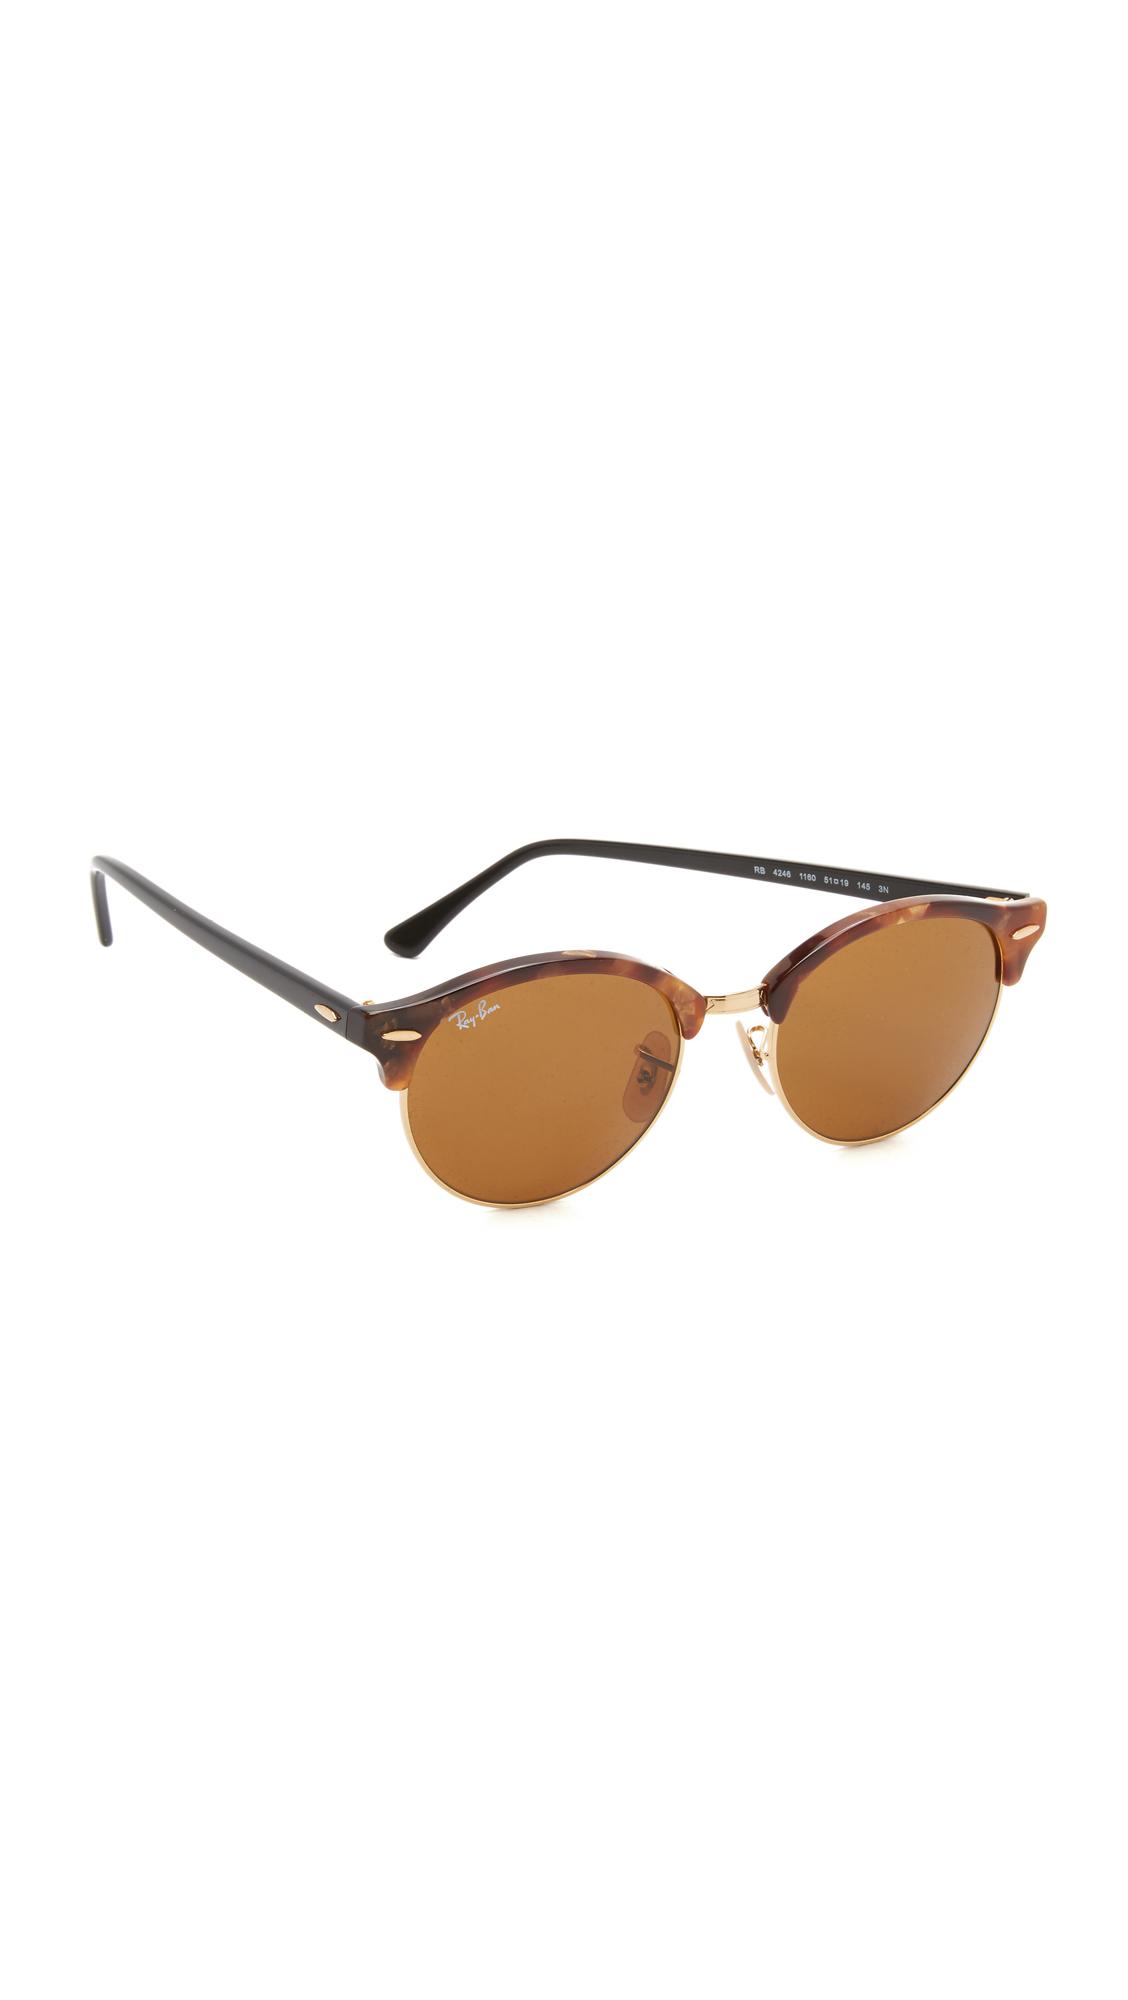 71b9b0753122 RAY BAN Round Clubmaster Sunglasses